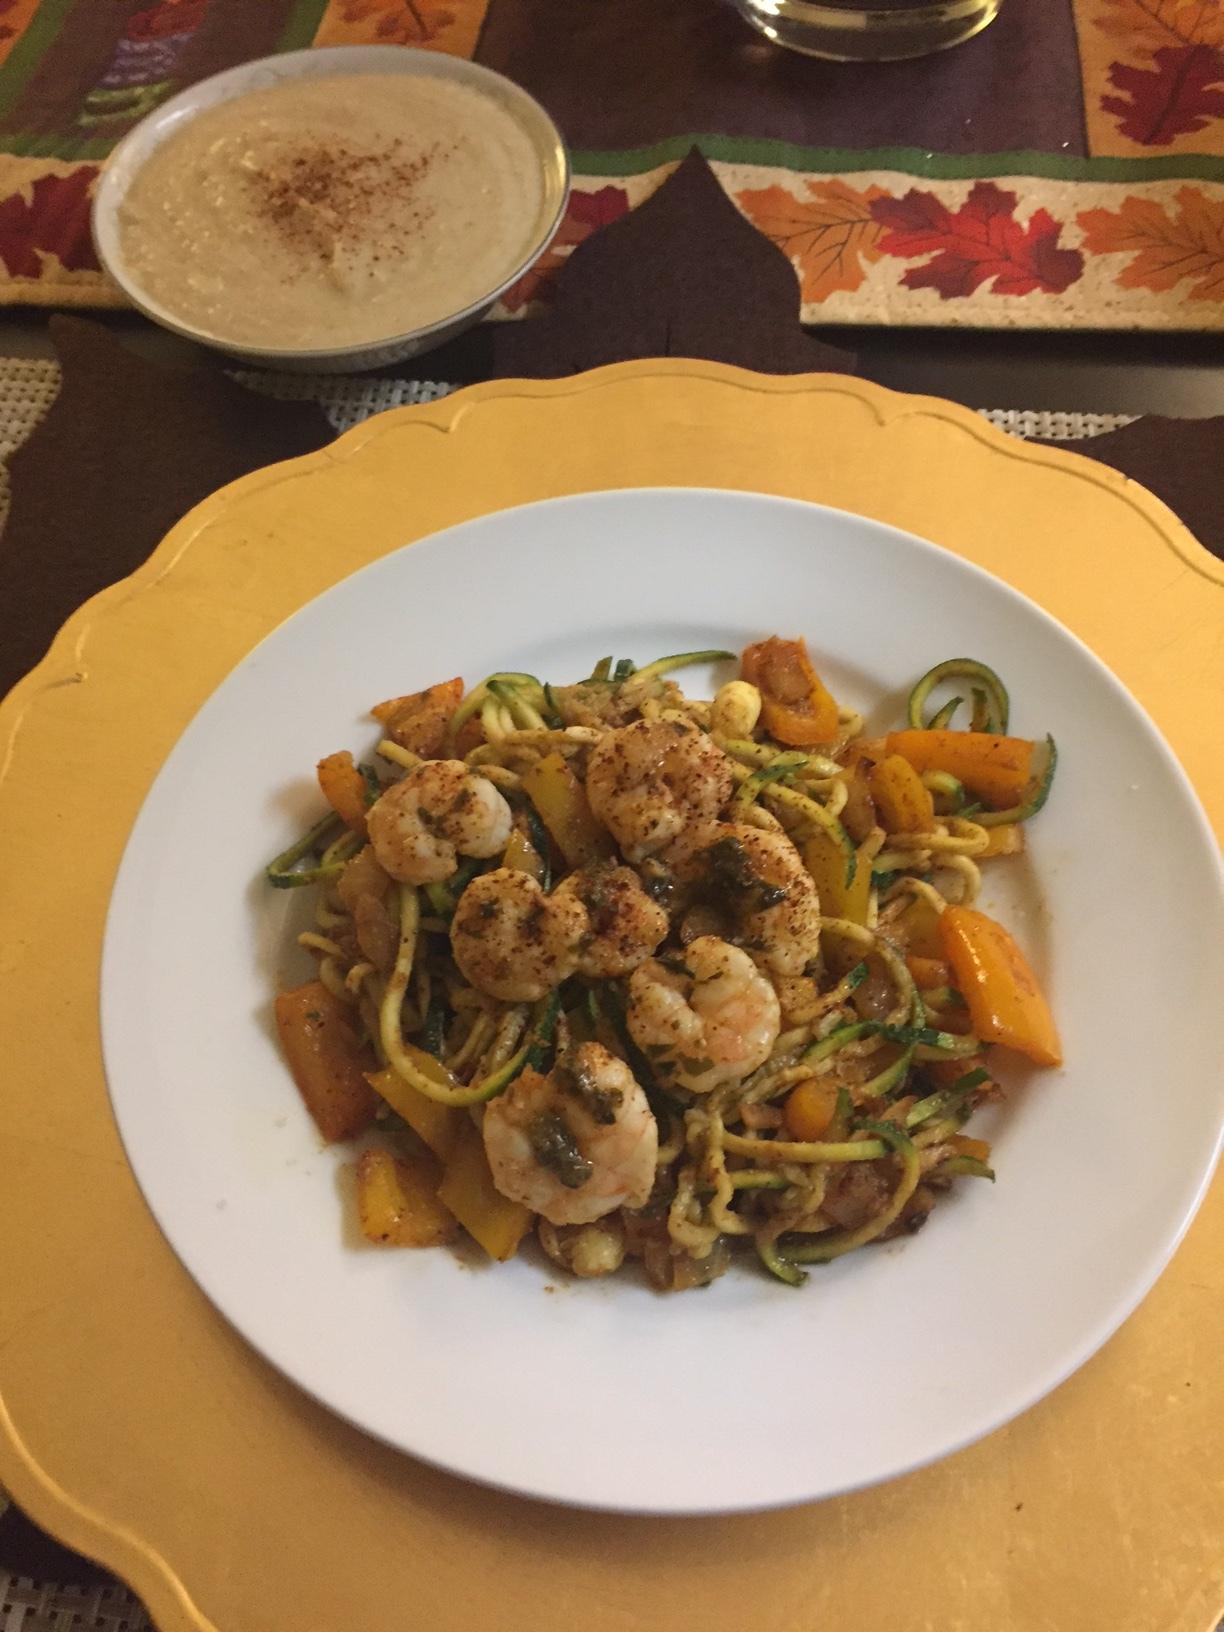 Cilantro Lime Shrimp with Zucchini Pasta & Cauliflower Soup - Paleo & Whole 30